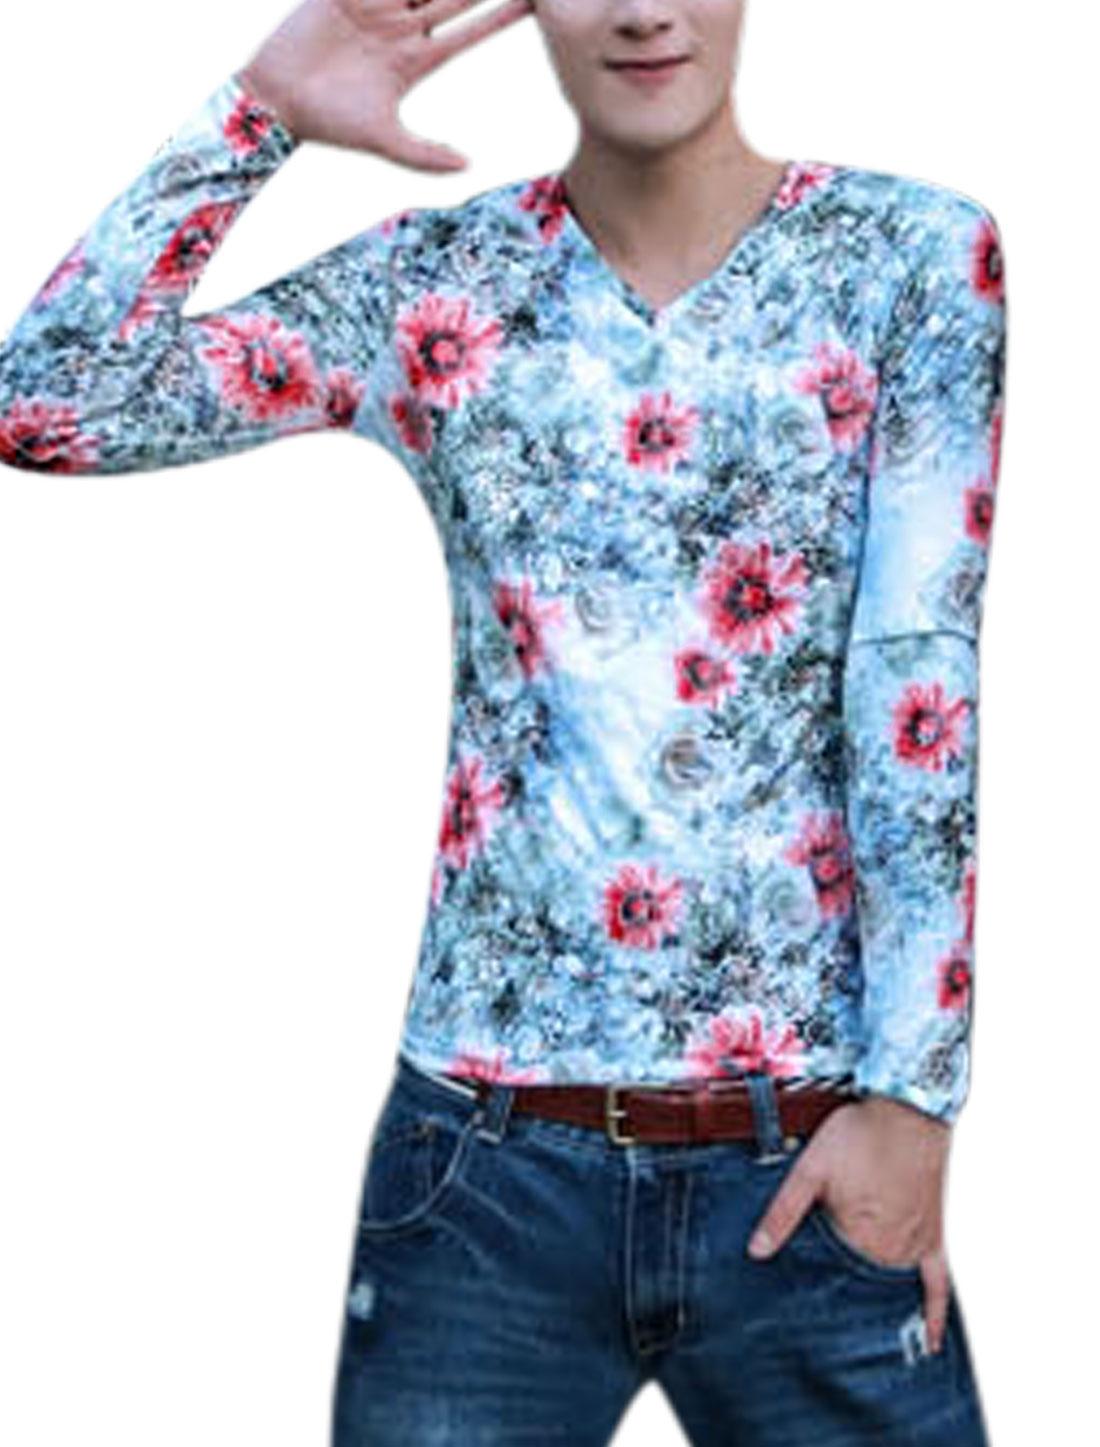 Men Allover Floral Prints V Neck Long Sleeves T-shirt Light Blue S